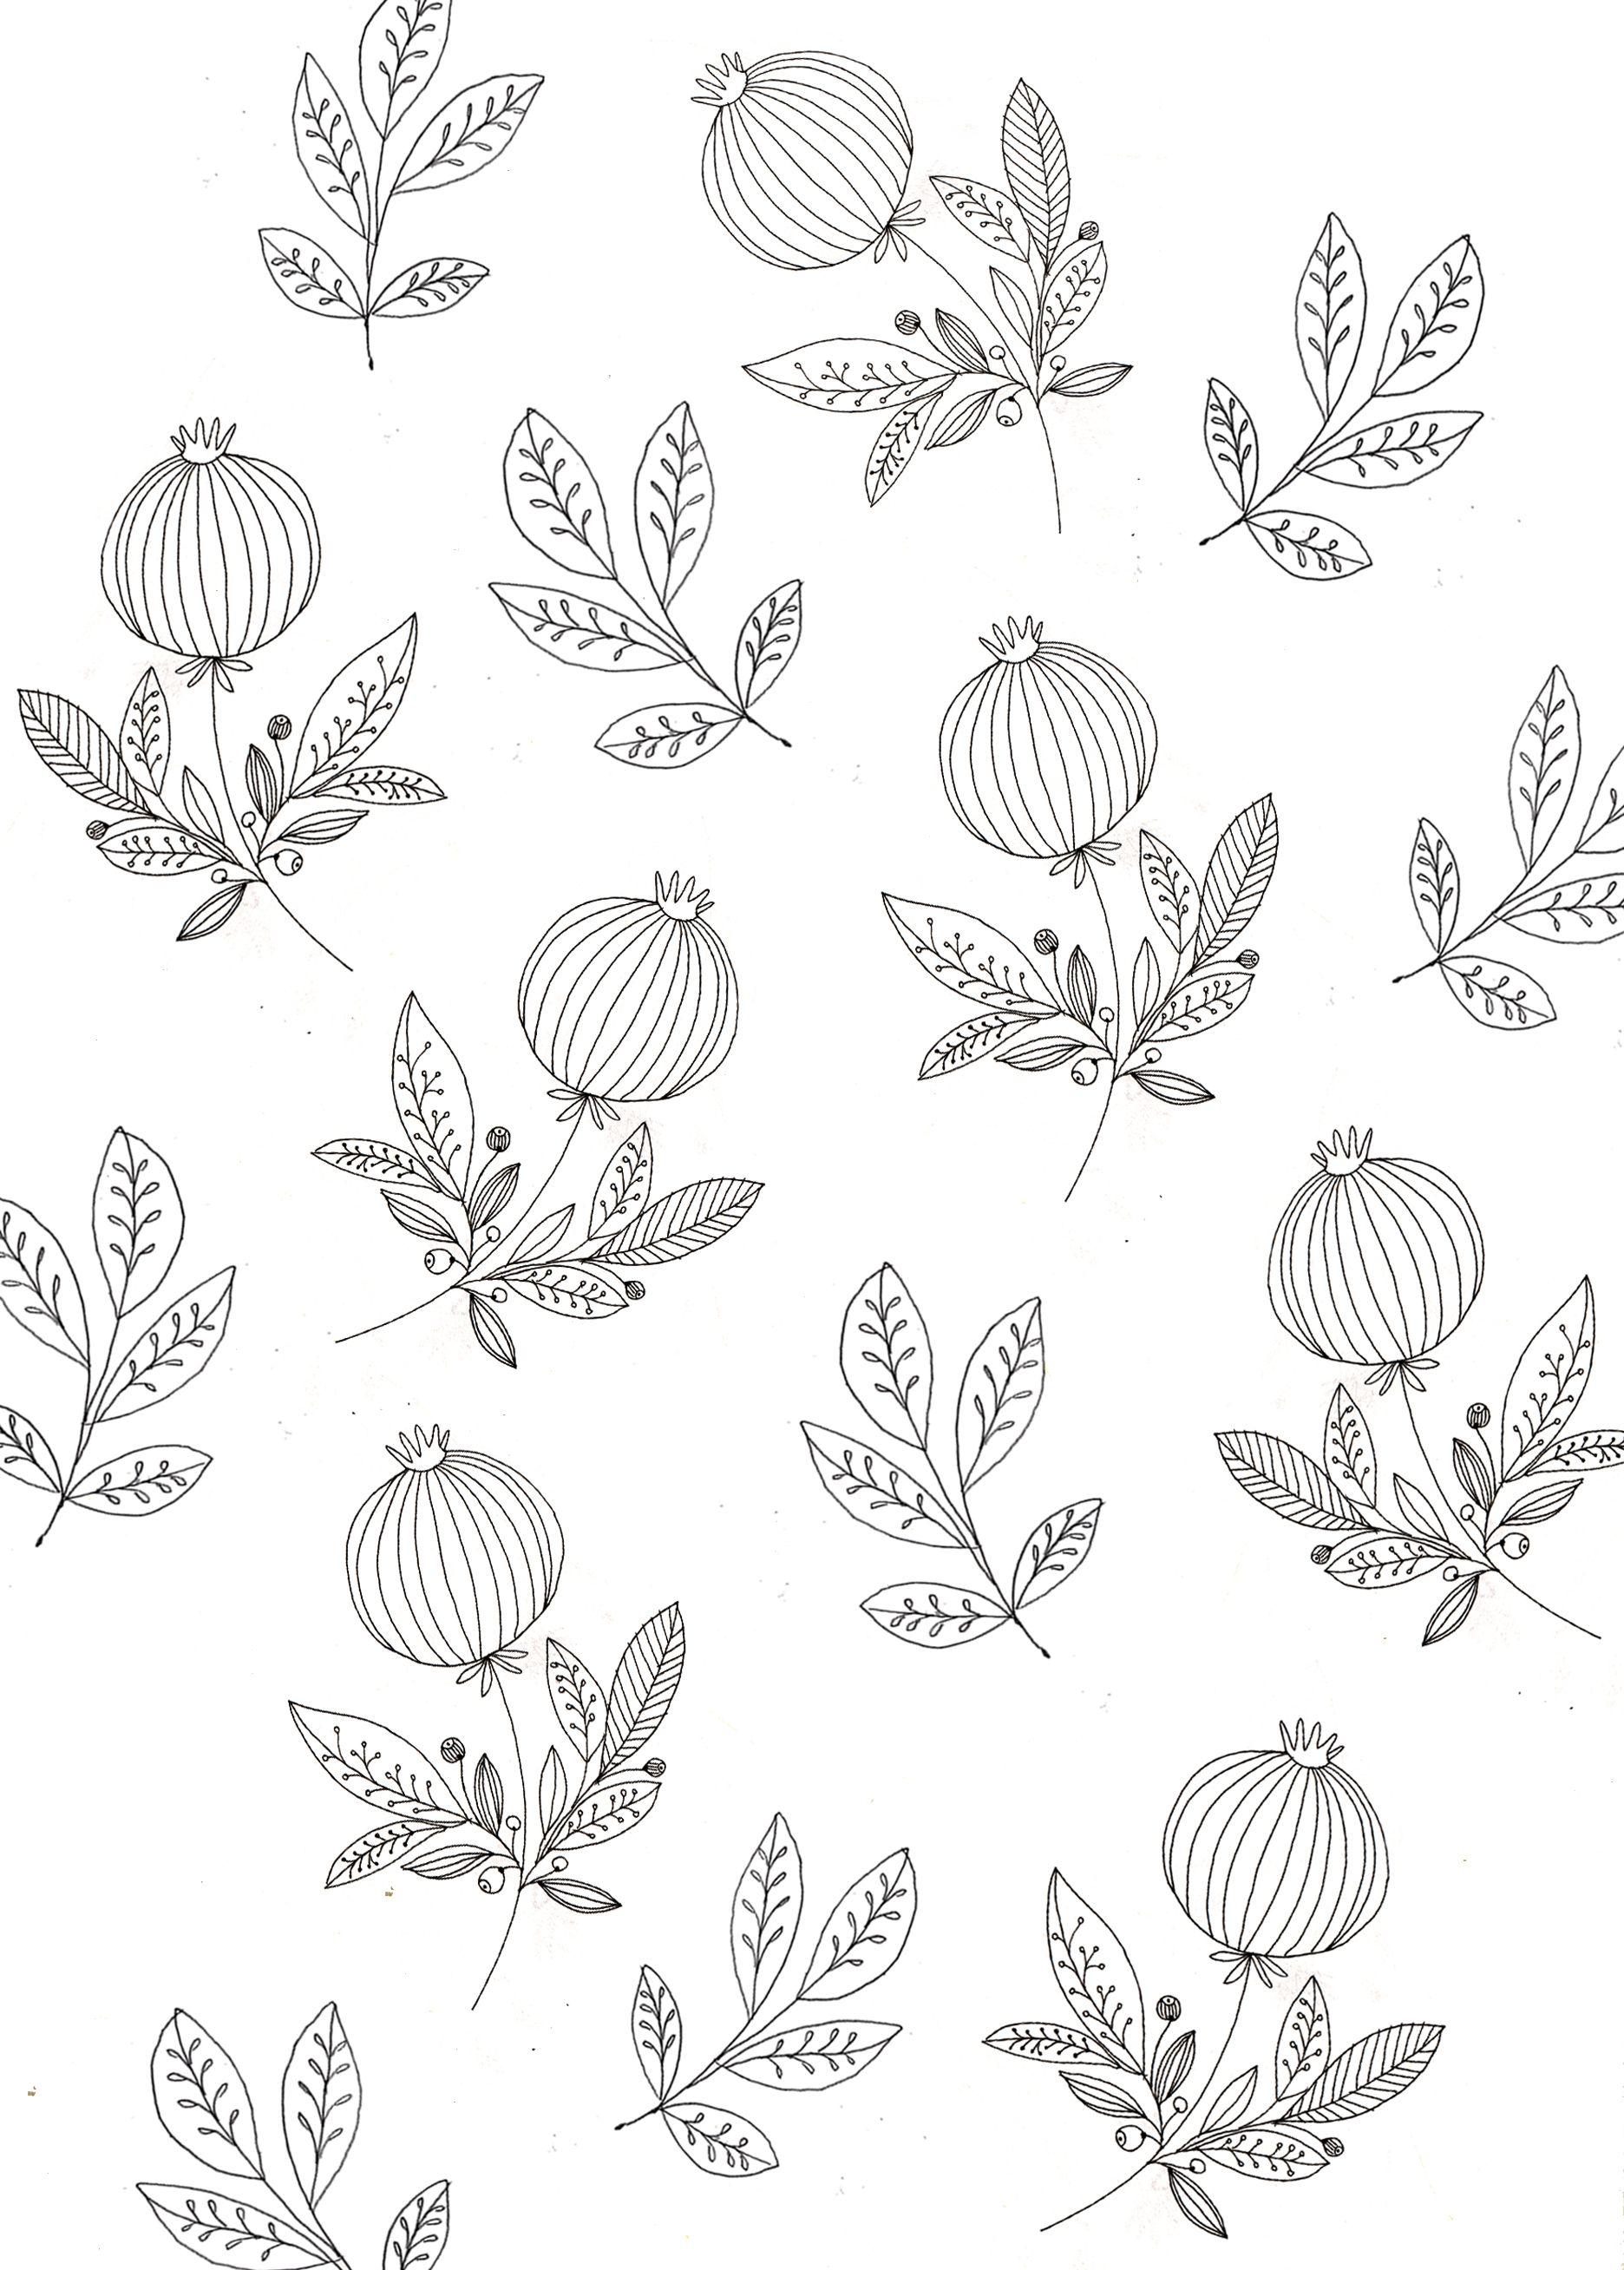 Pomegranate wallpaper. | Katt Frank. | flores silvestres | Pinterest ...